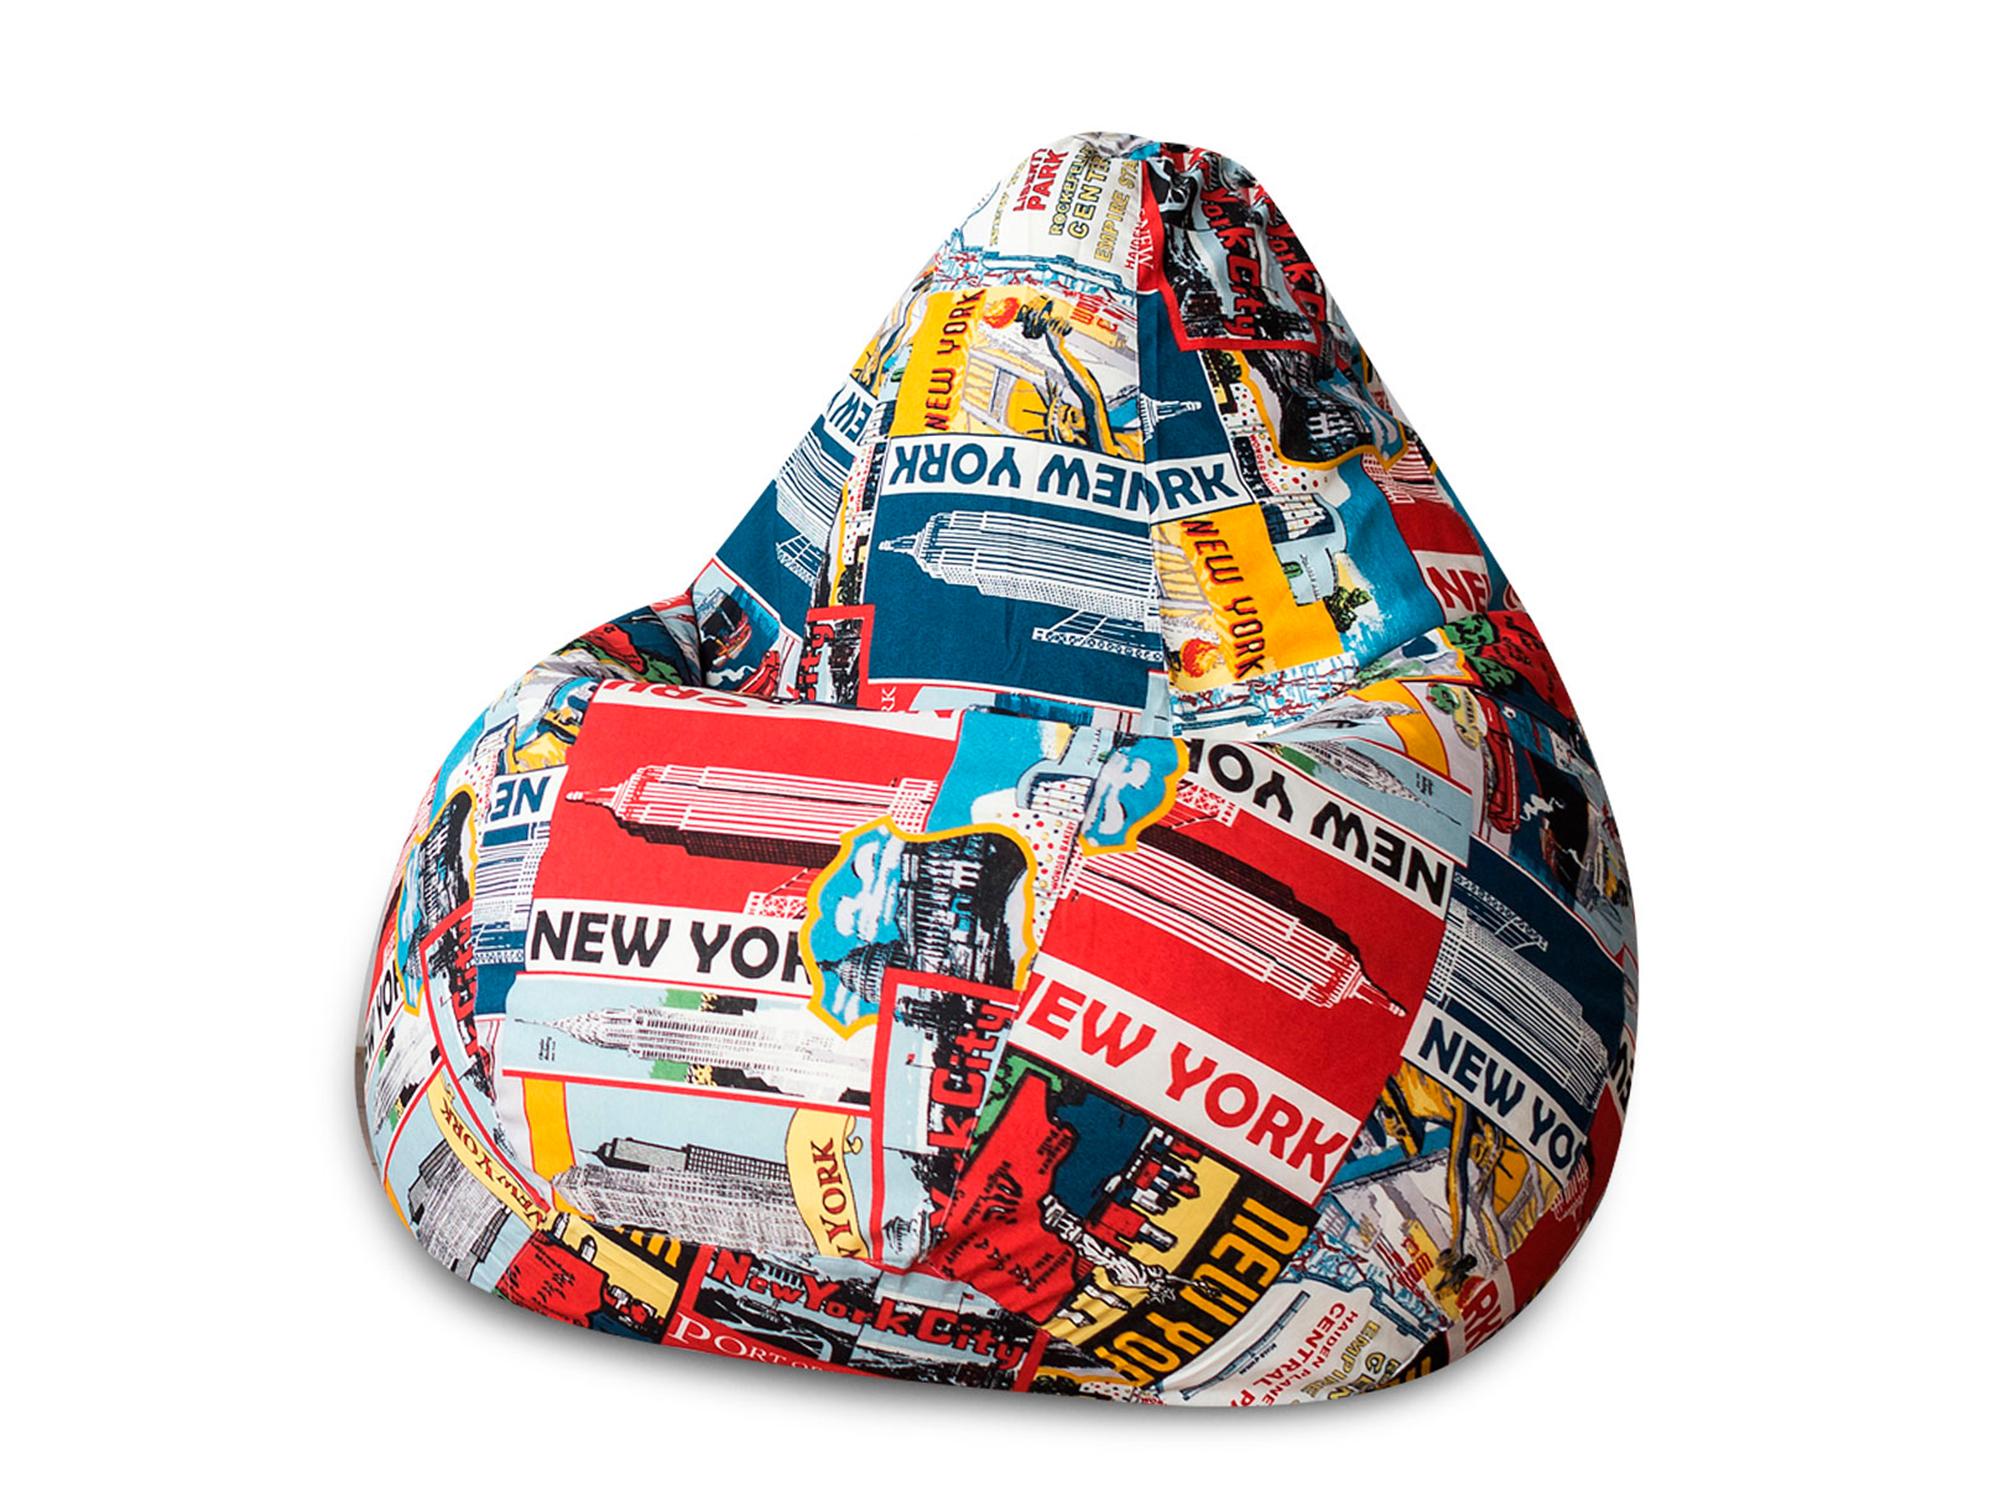 Кресло Мешок New York XL 125х85 MebelVia Разноцветный, Жаккард кресло мешок флаги xl 125х85 mebelvia